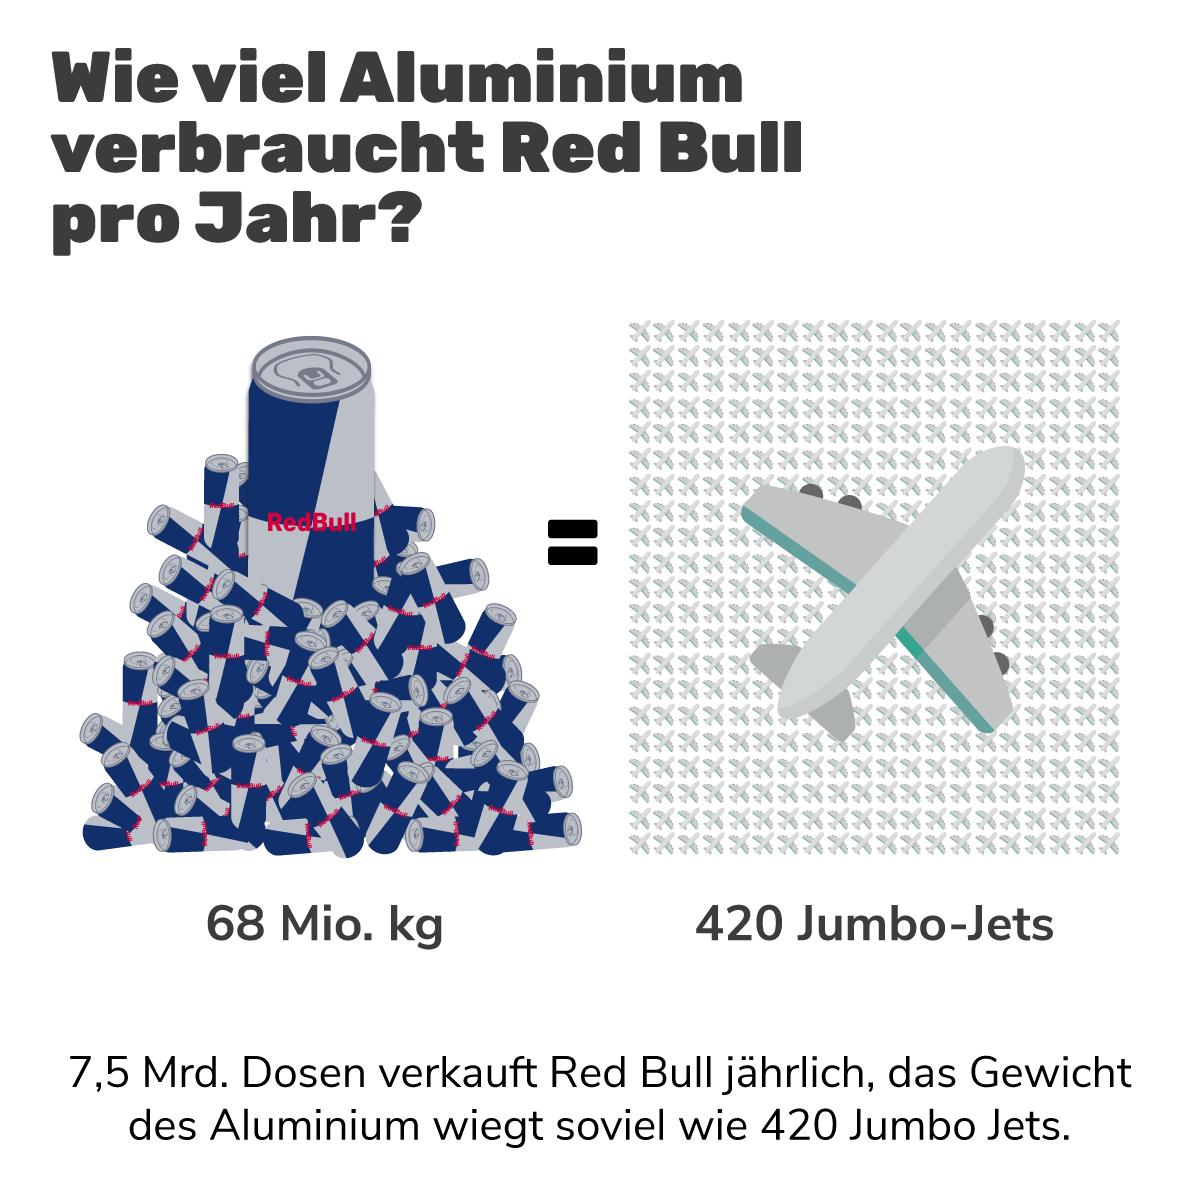 Grafik: So viele Kilogramm Alu verbraucht Red Bull jährlich